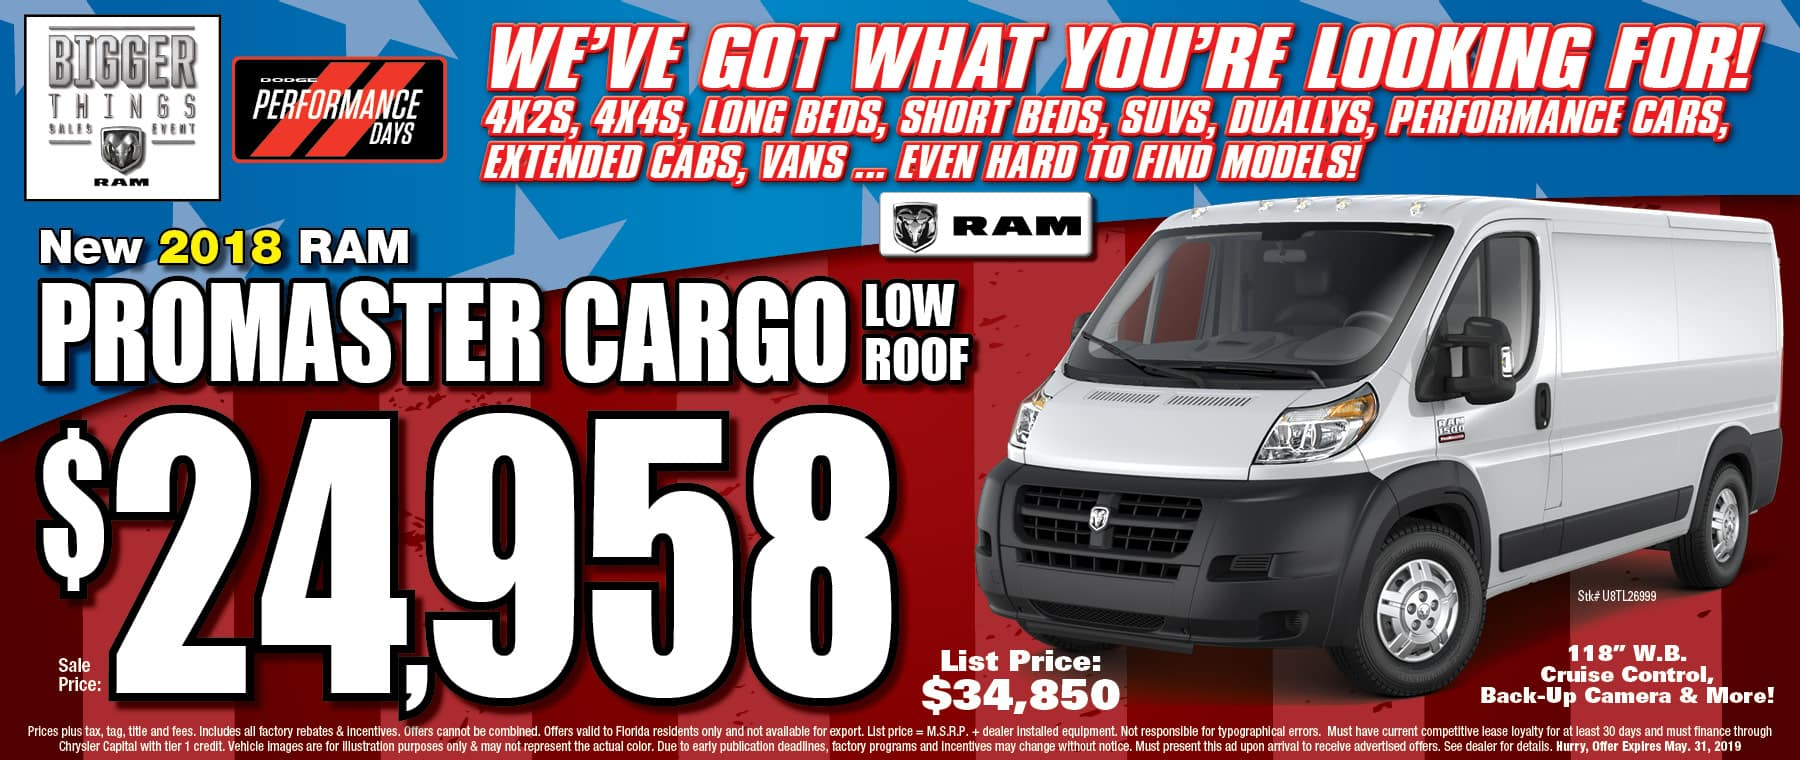 Ram ProMaster Cargo!